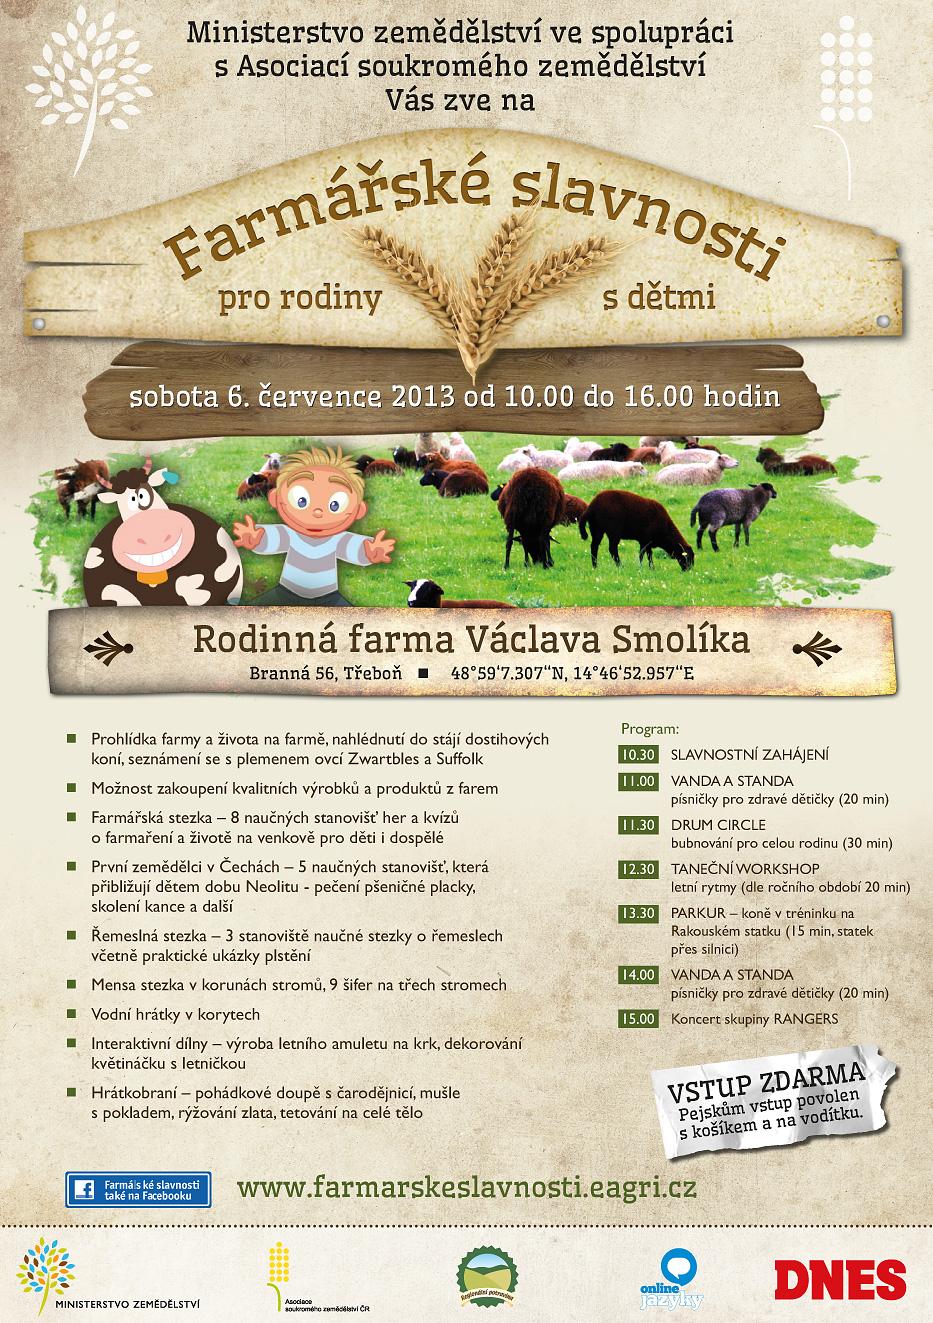 http://eagri.cz/public/web/file/238707/plakat_Branna.jpg